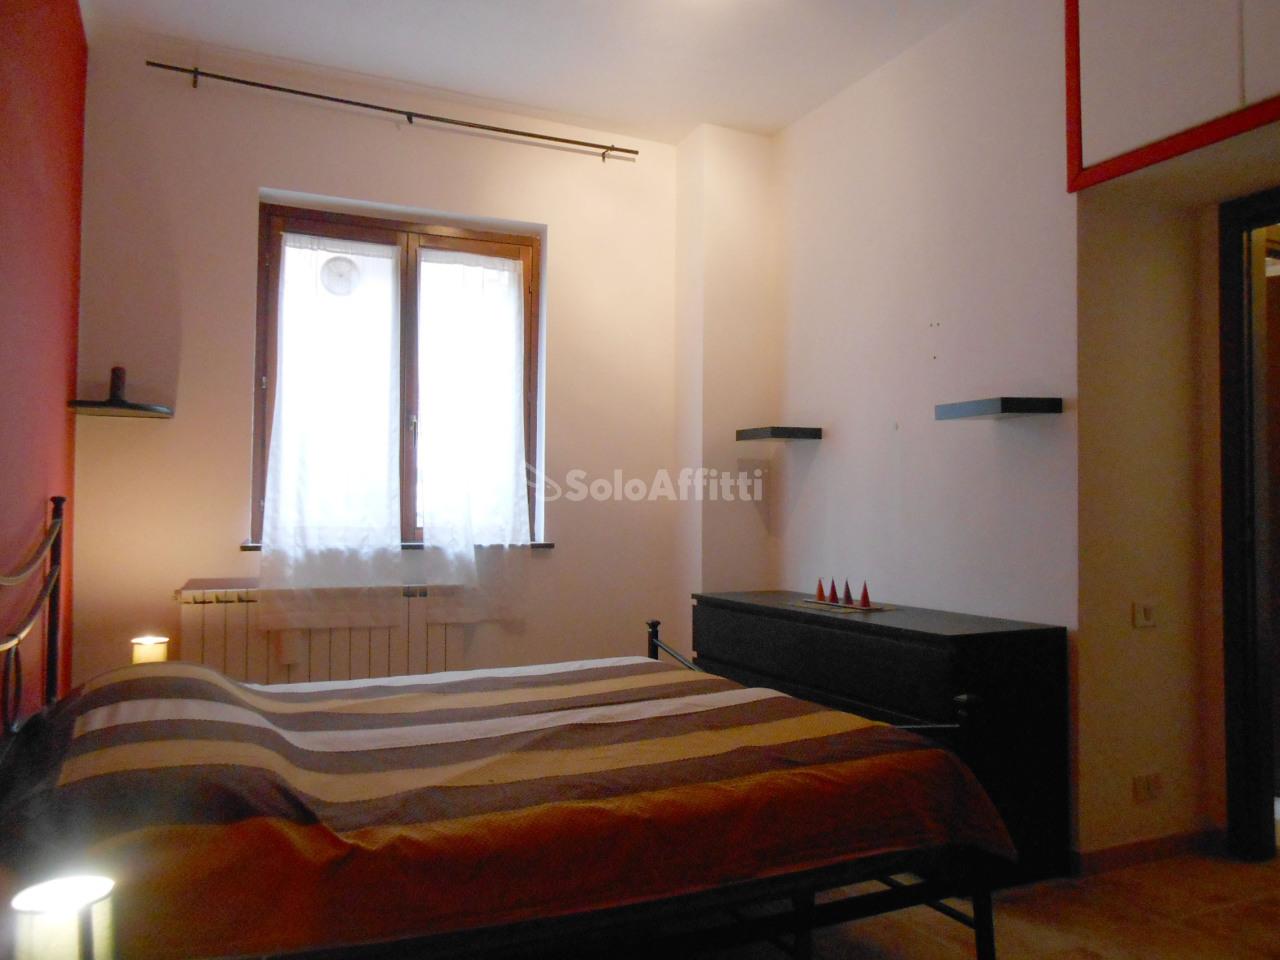 Bilocale Marino Via Nettunense Vecchia 1 13